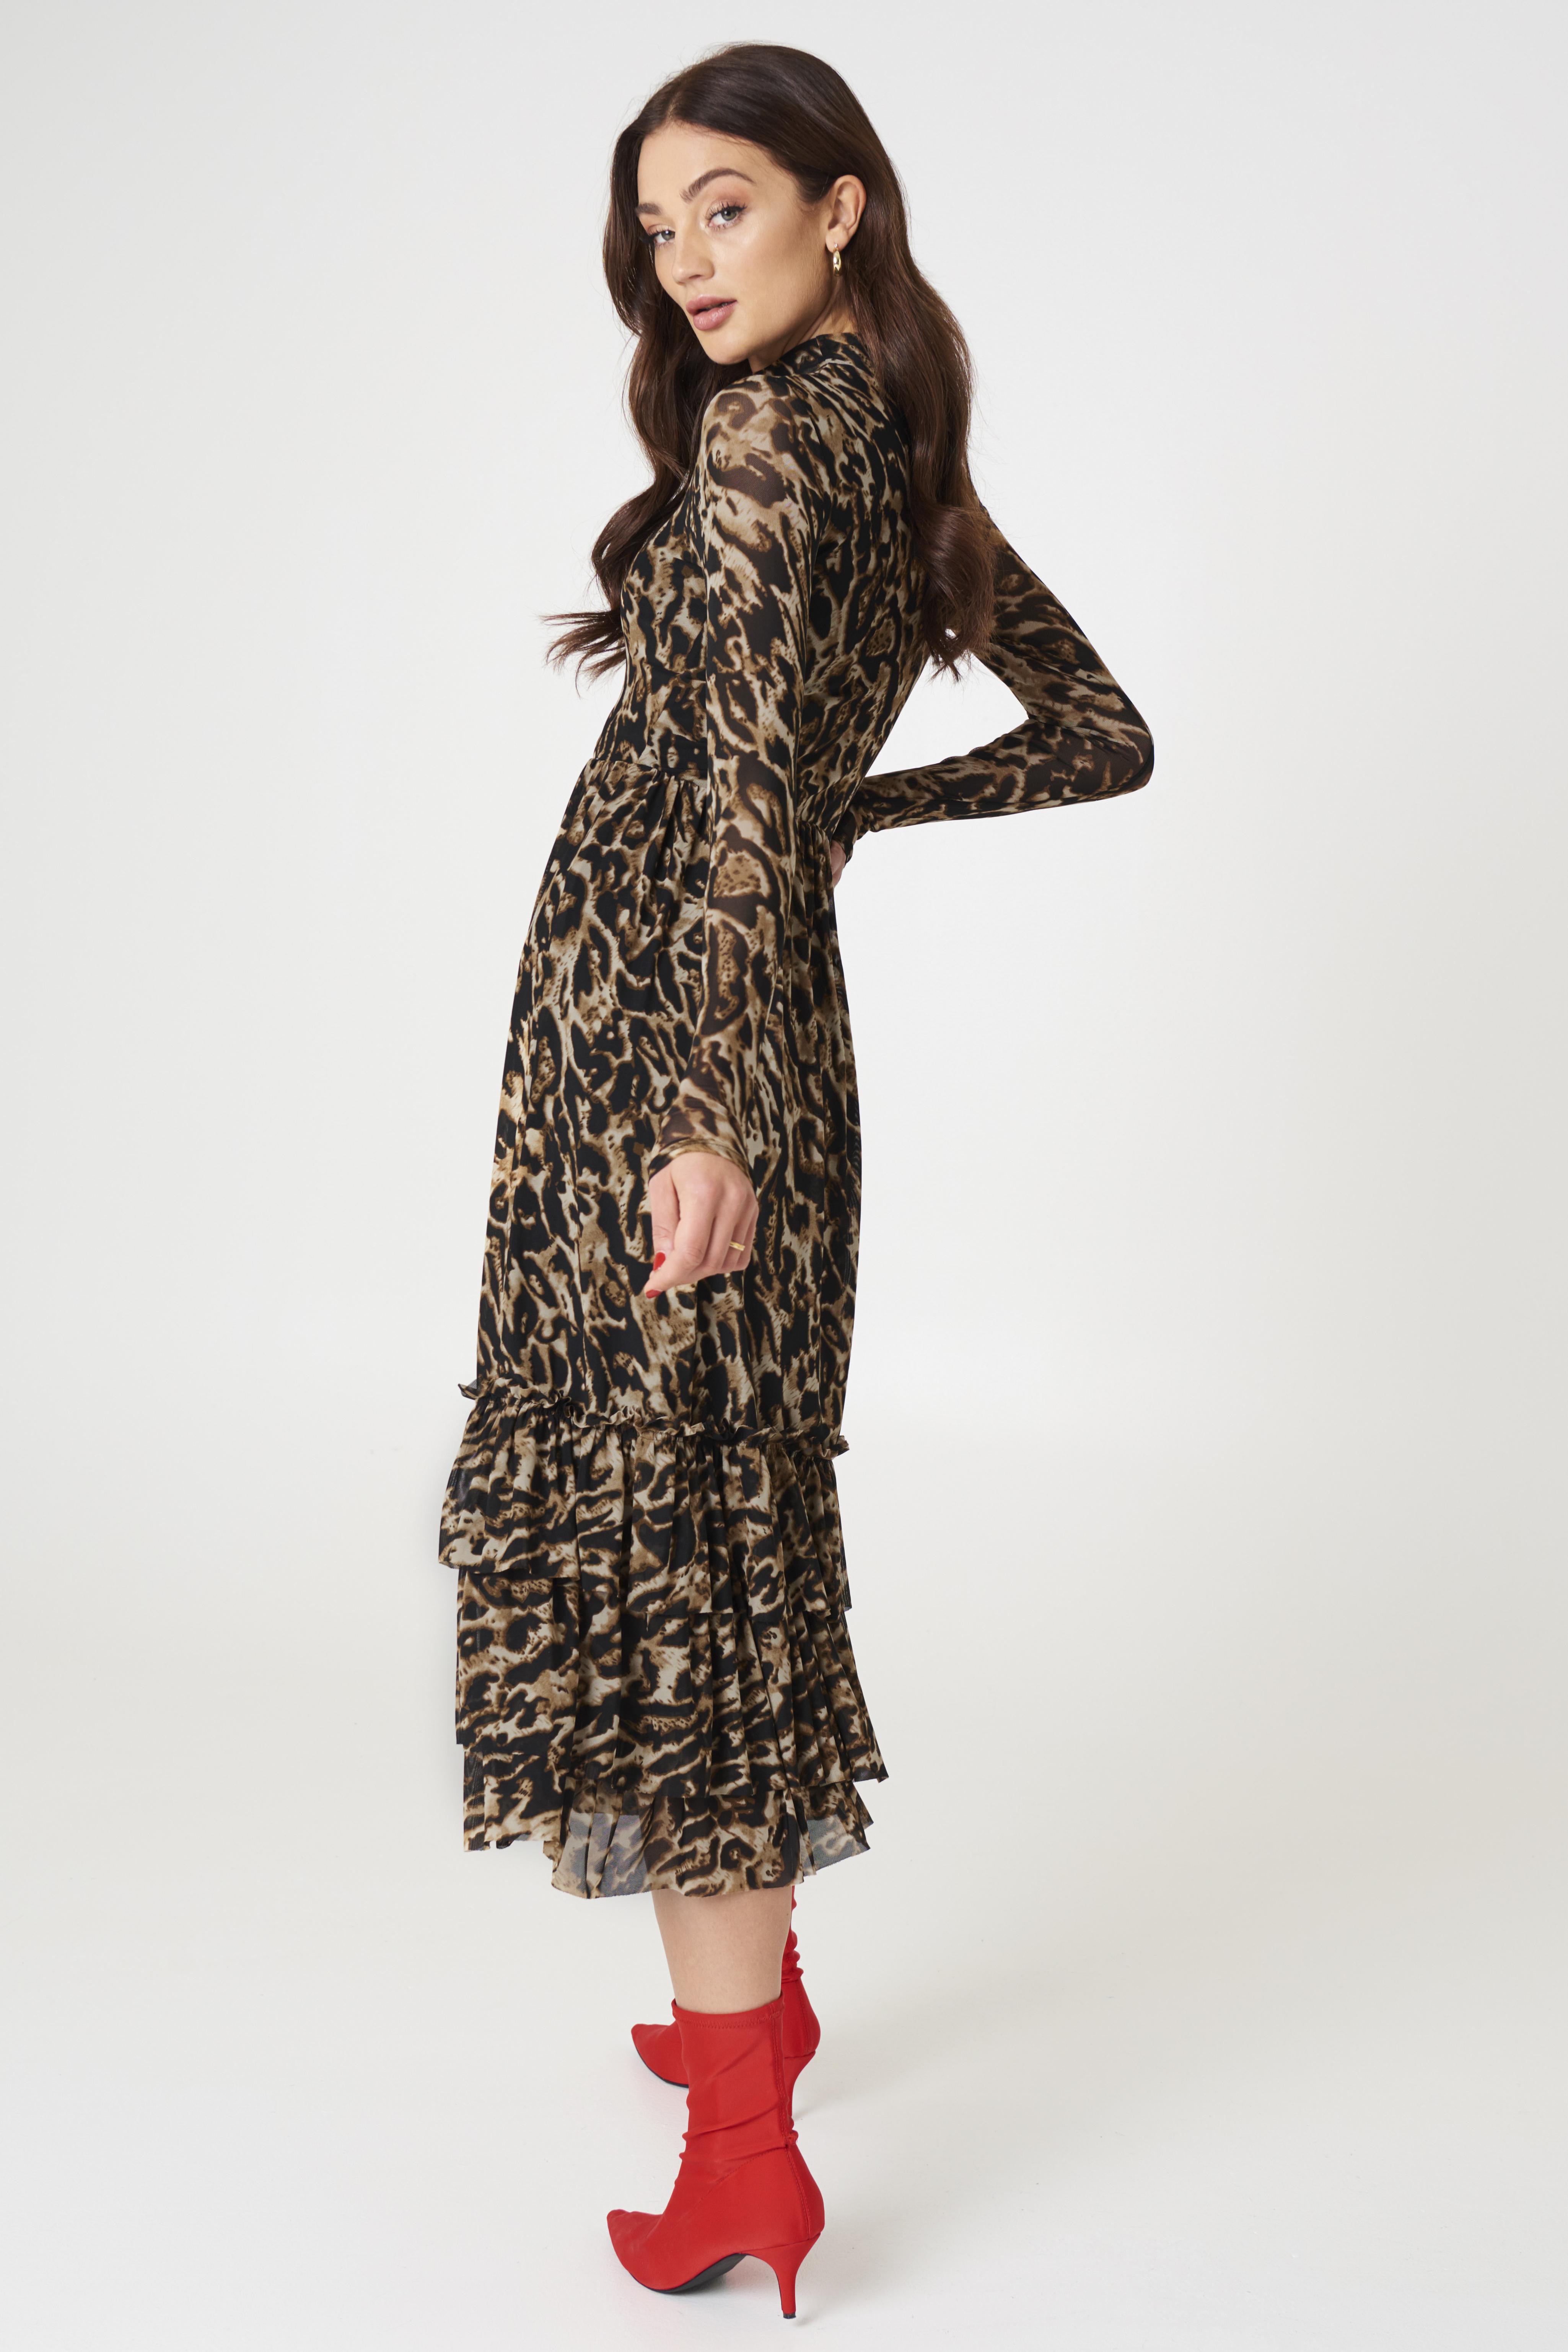 Dresses | Shop Party dresses, Beachwear & Caftans | na-kd.com